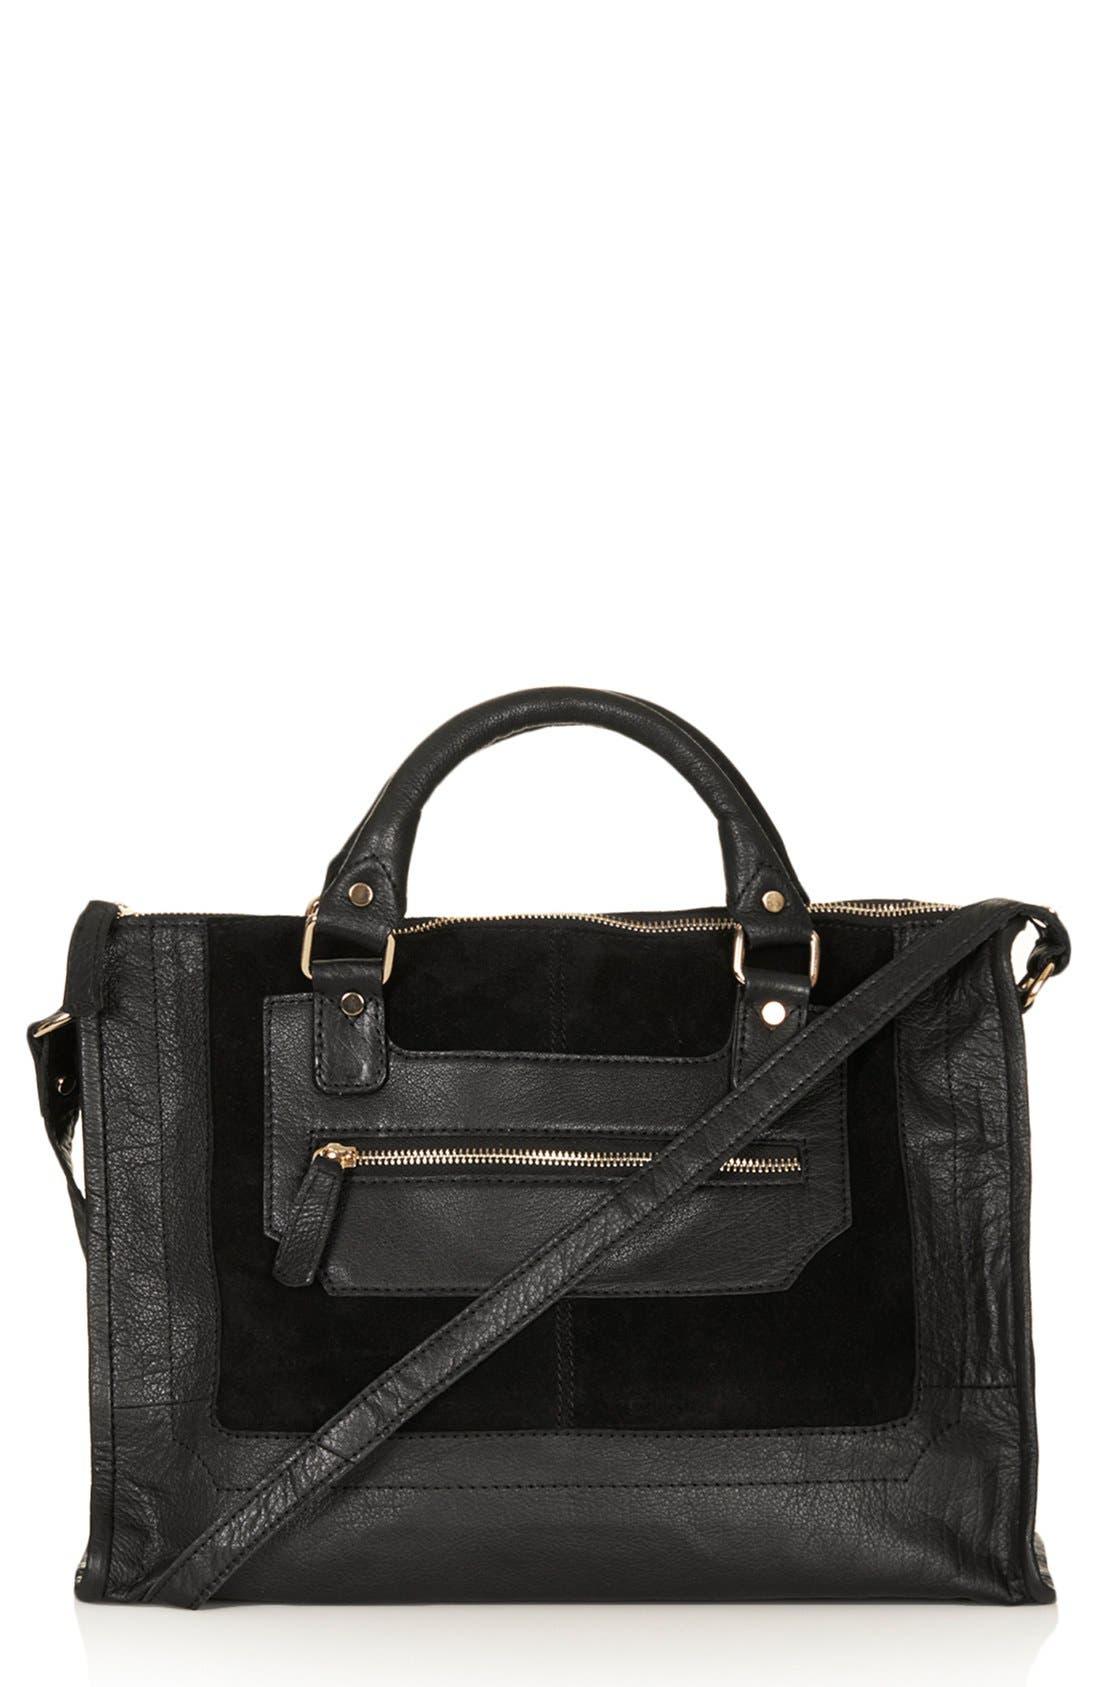 Main Image - Topshop Leather & Suede Satchel